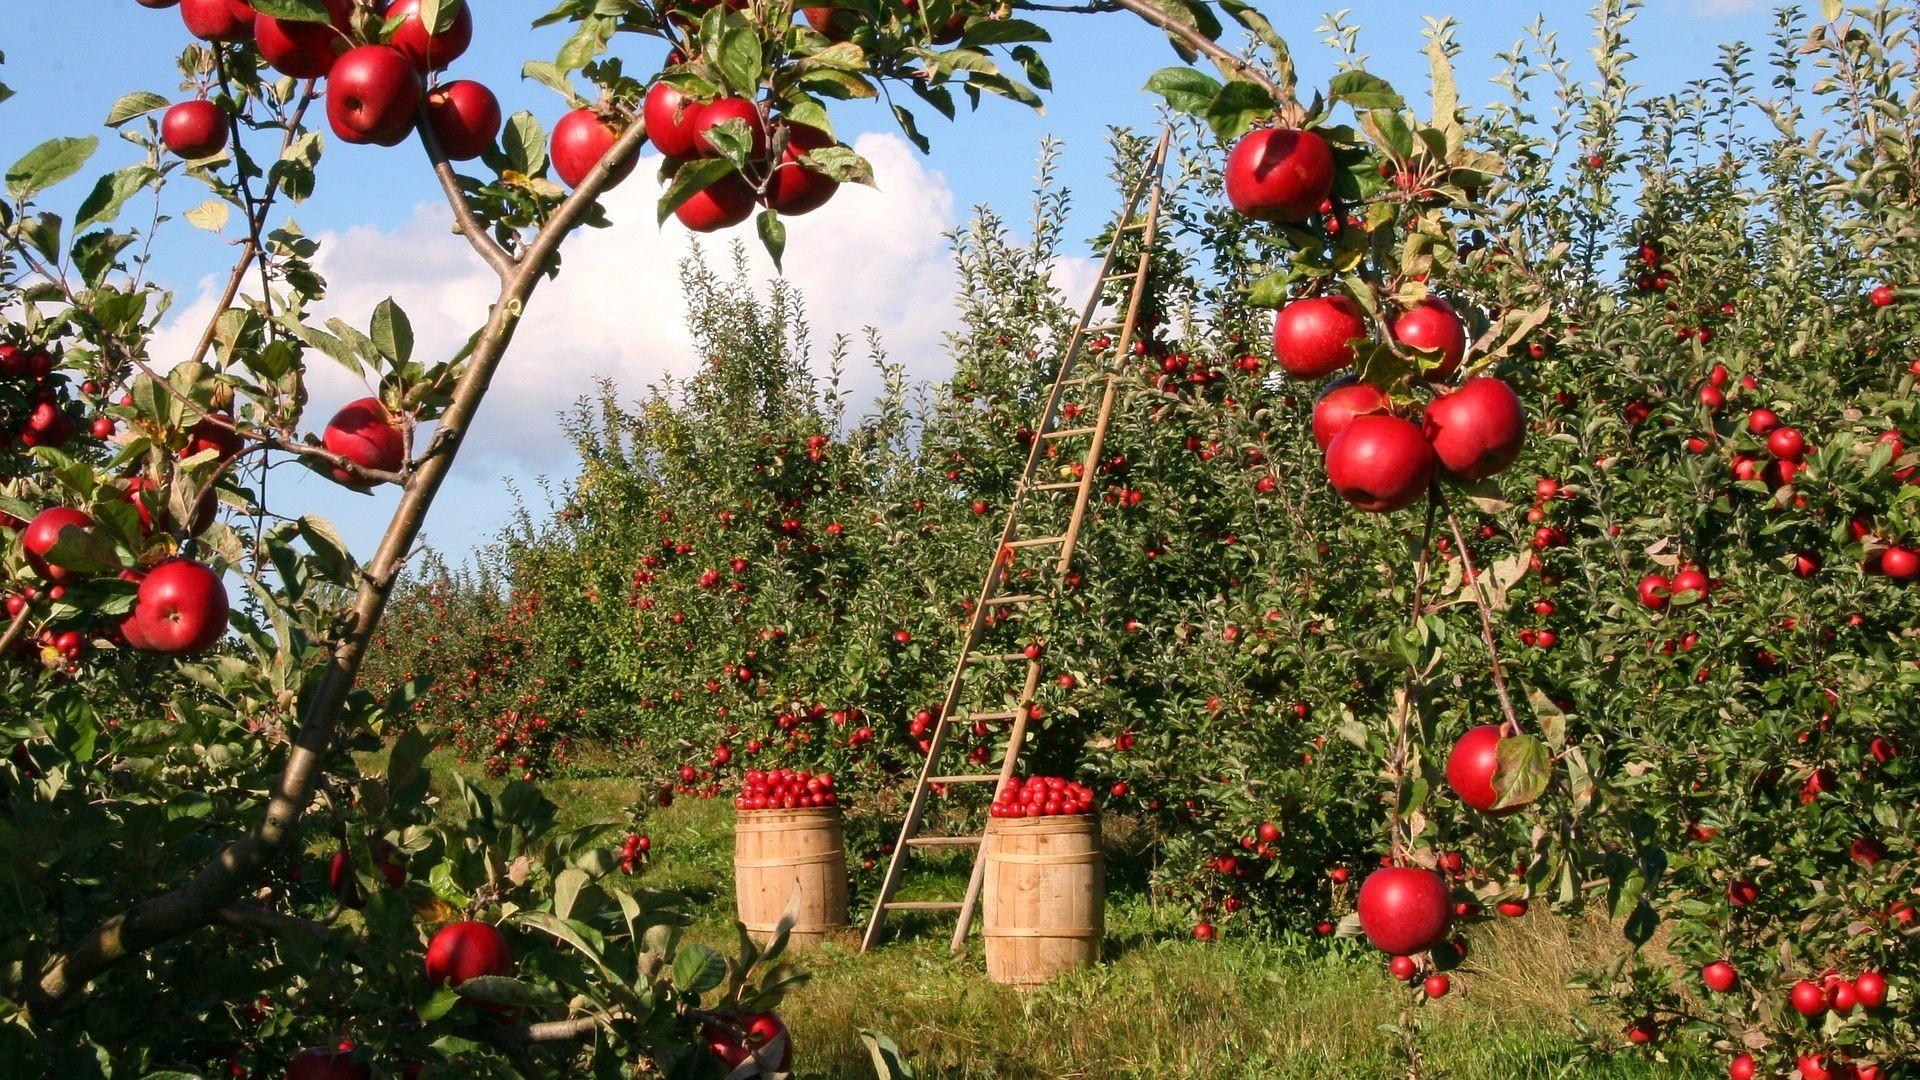 Res: 1920x1080, Apple Trees Garden HD Wallpaper